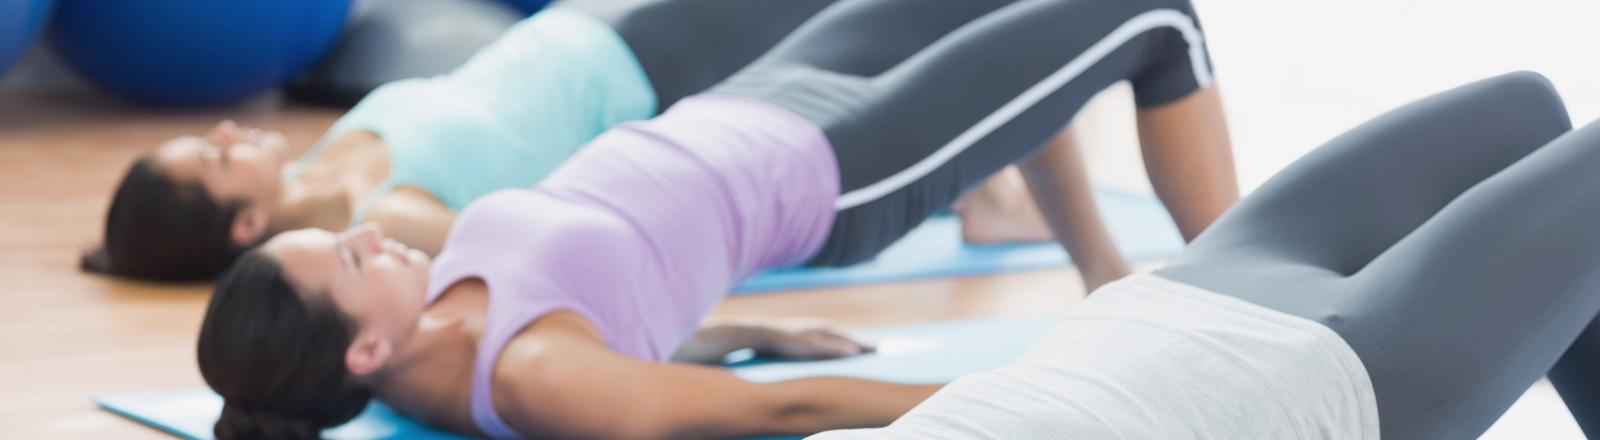 cabecera grupal trabajo corporal consciente fisioclinics bilbao